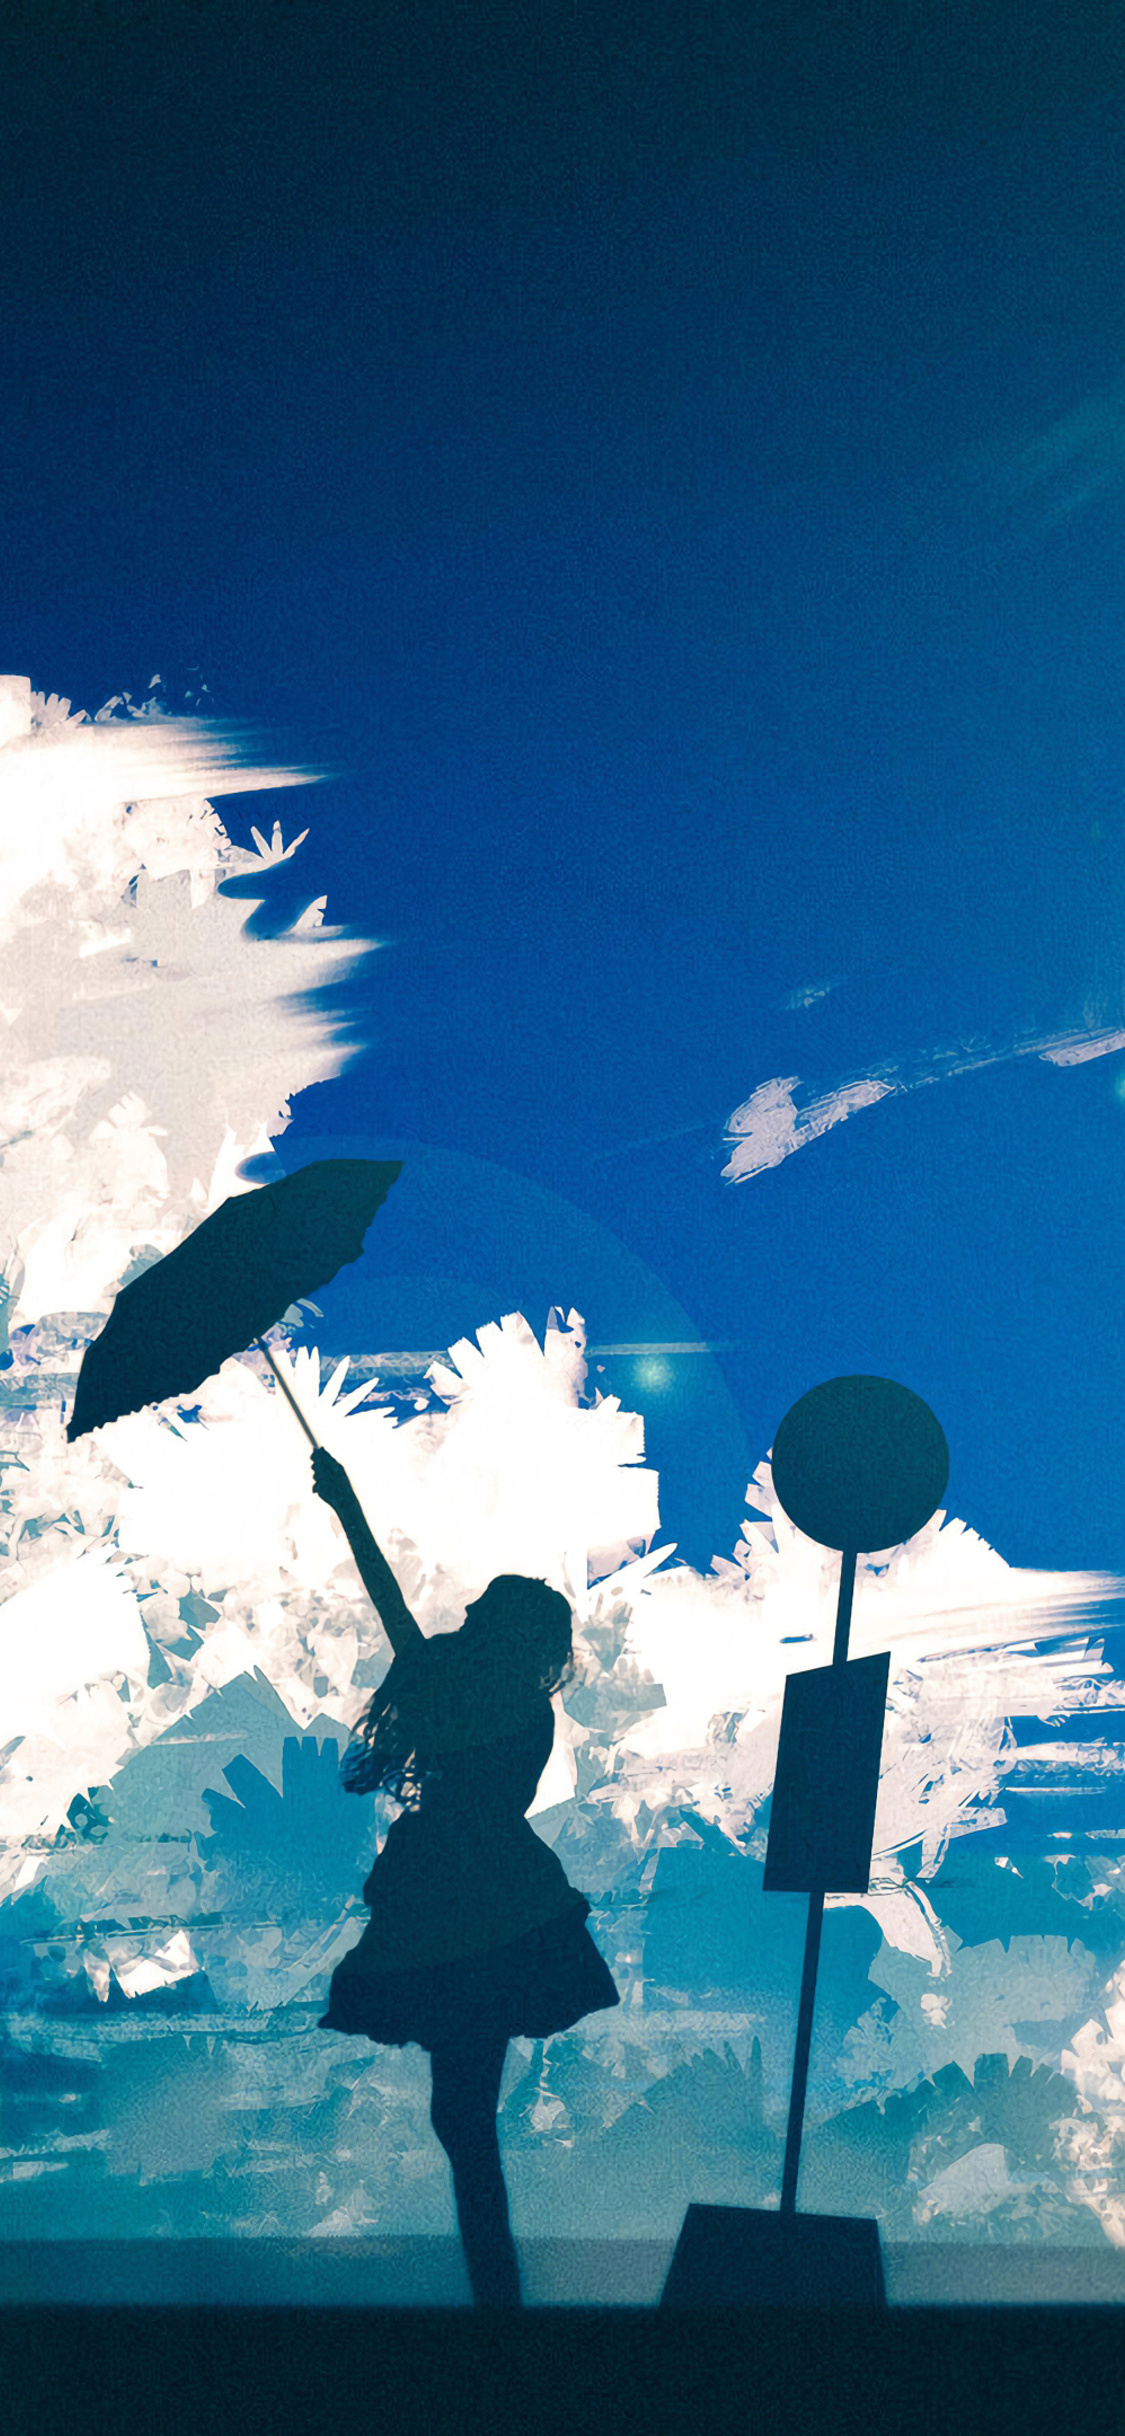 stormy-wind-umbrella-girl-4k-v9.jpg